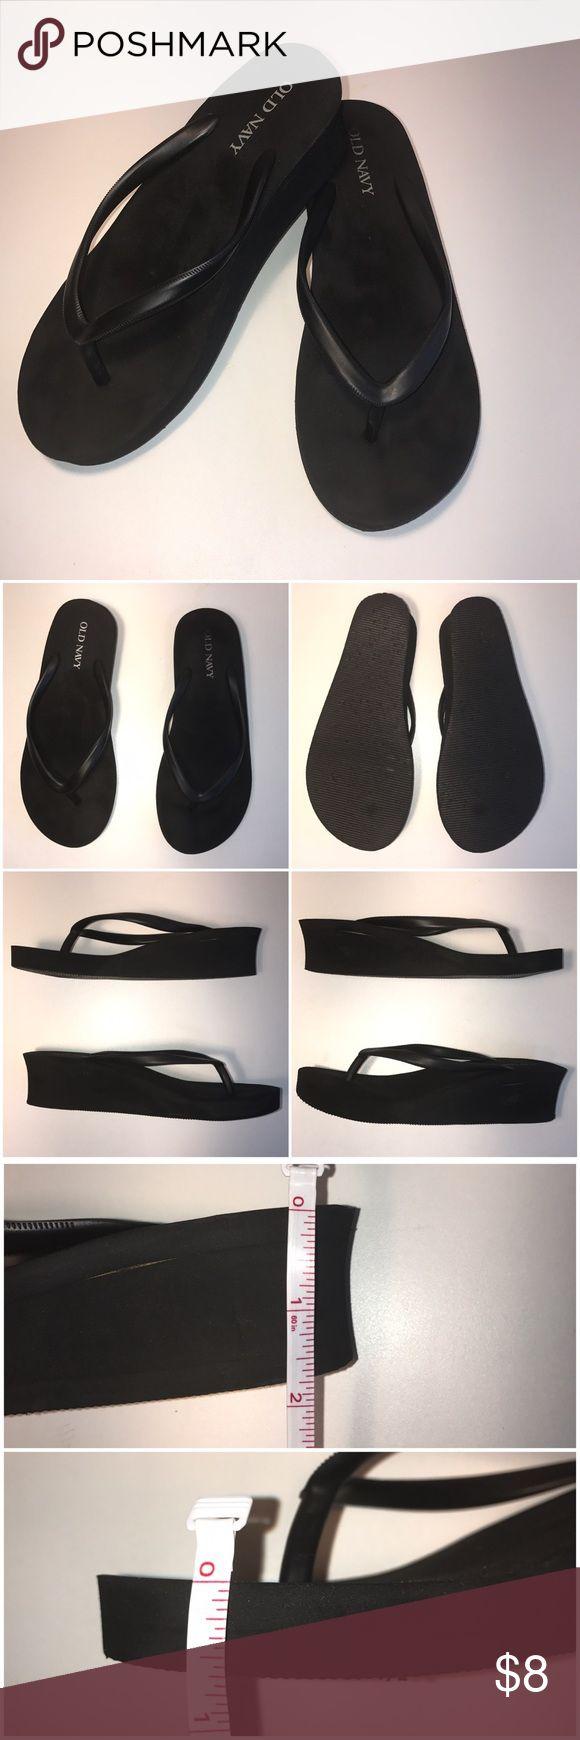 Black sandals old navy - Old Navy Black Wedge Flip Flops Size 6 Old Navy Black Wedge Flip Flops